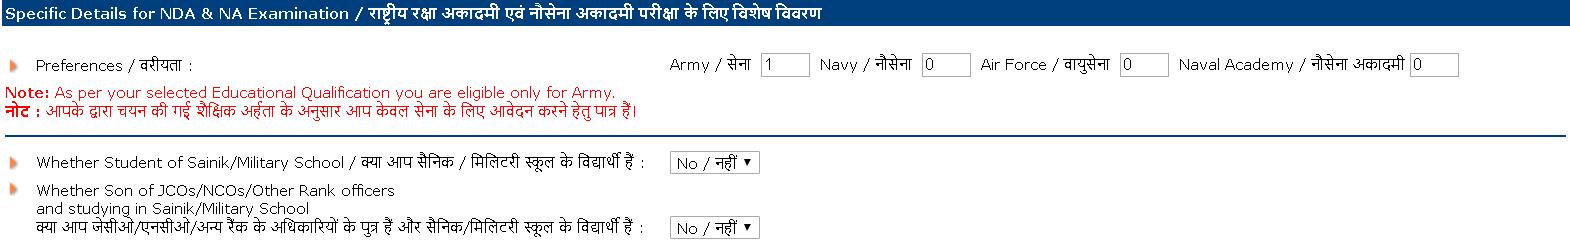 NDA Application Form Specific Details